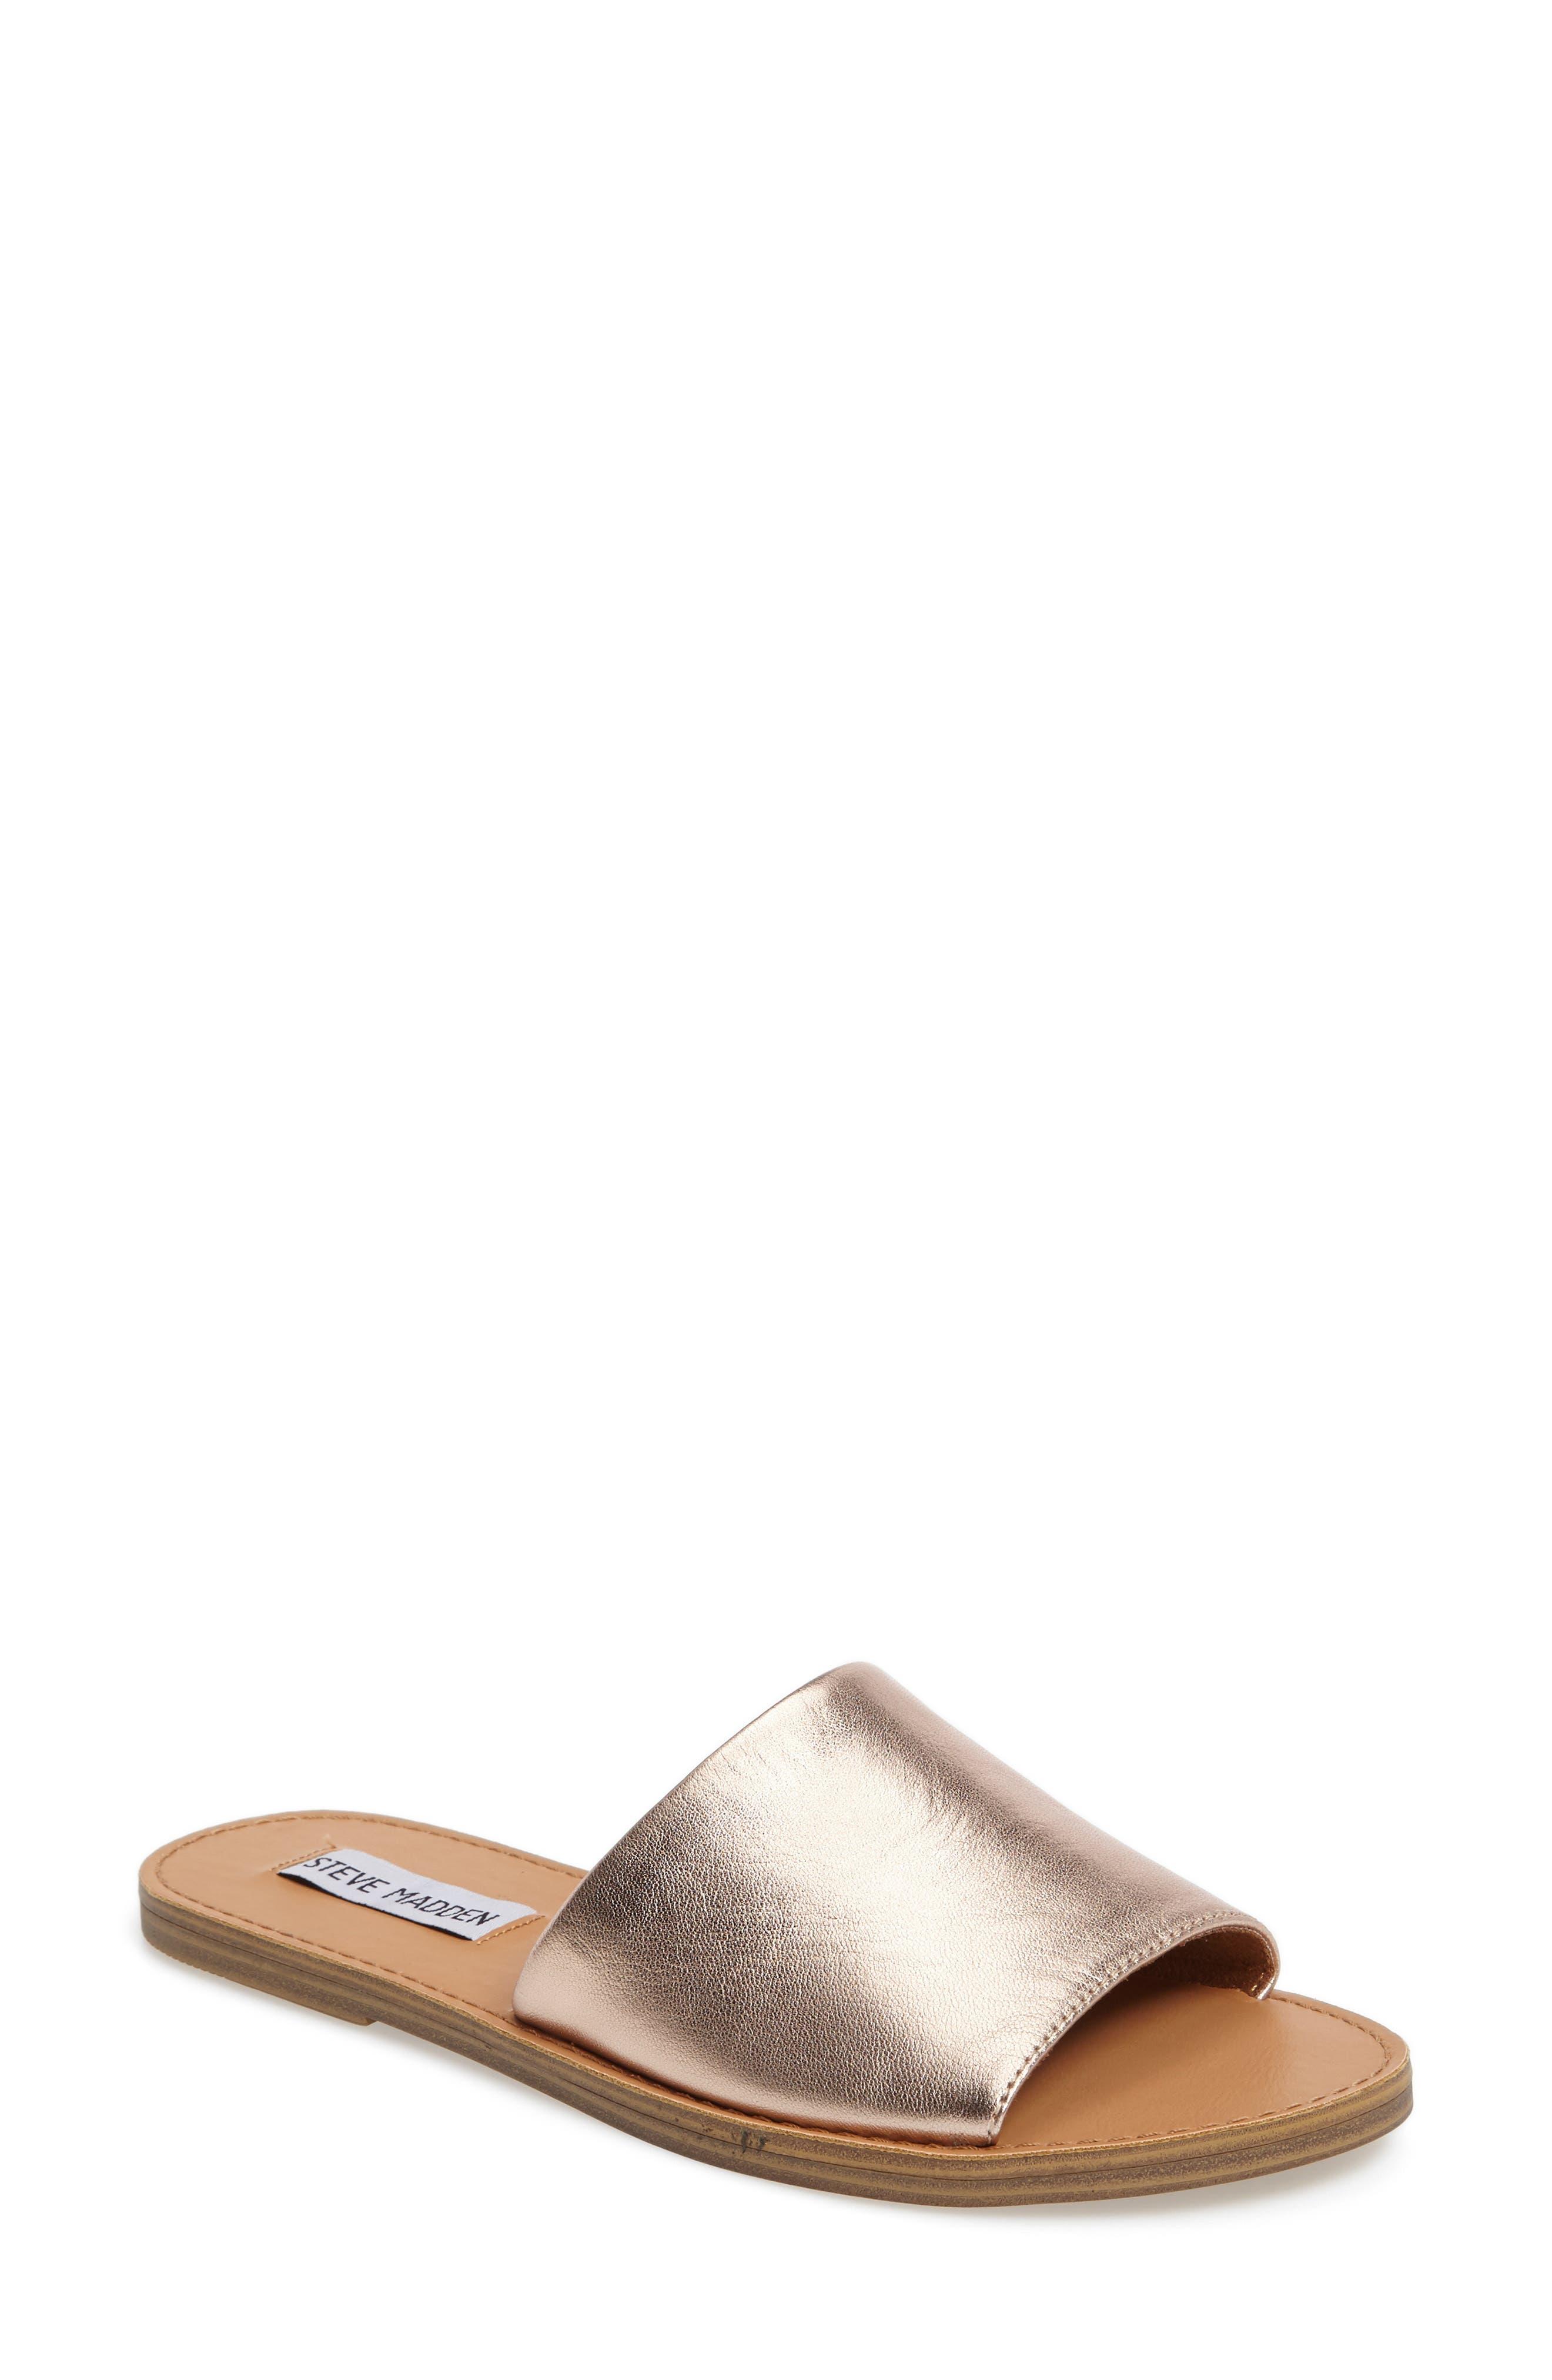 Grace Slide Sandal,                             Main thumbnail 1, color,                             Rosegold